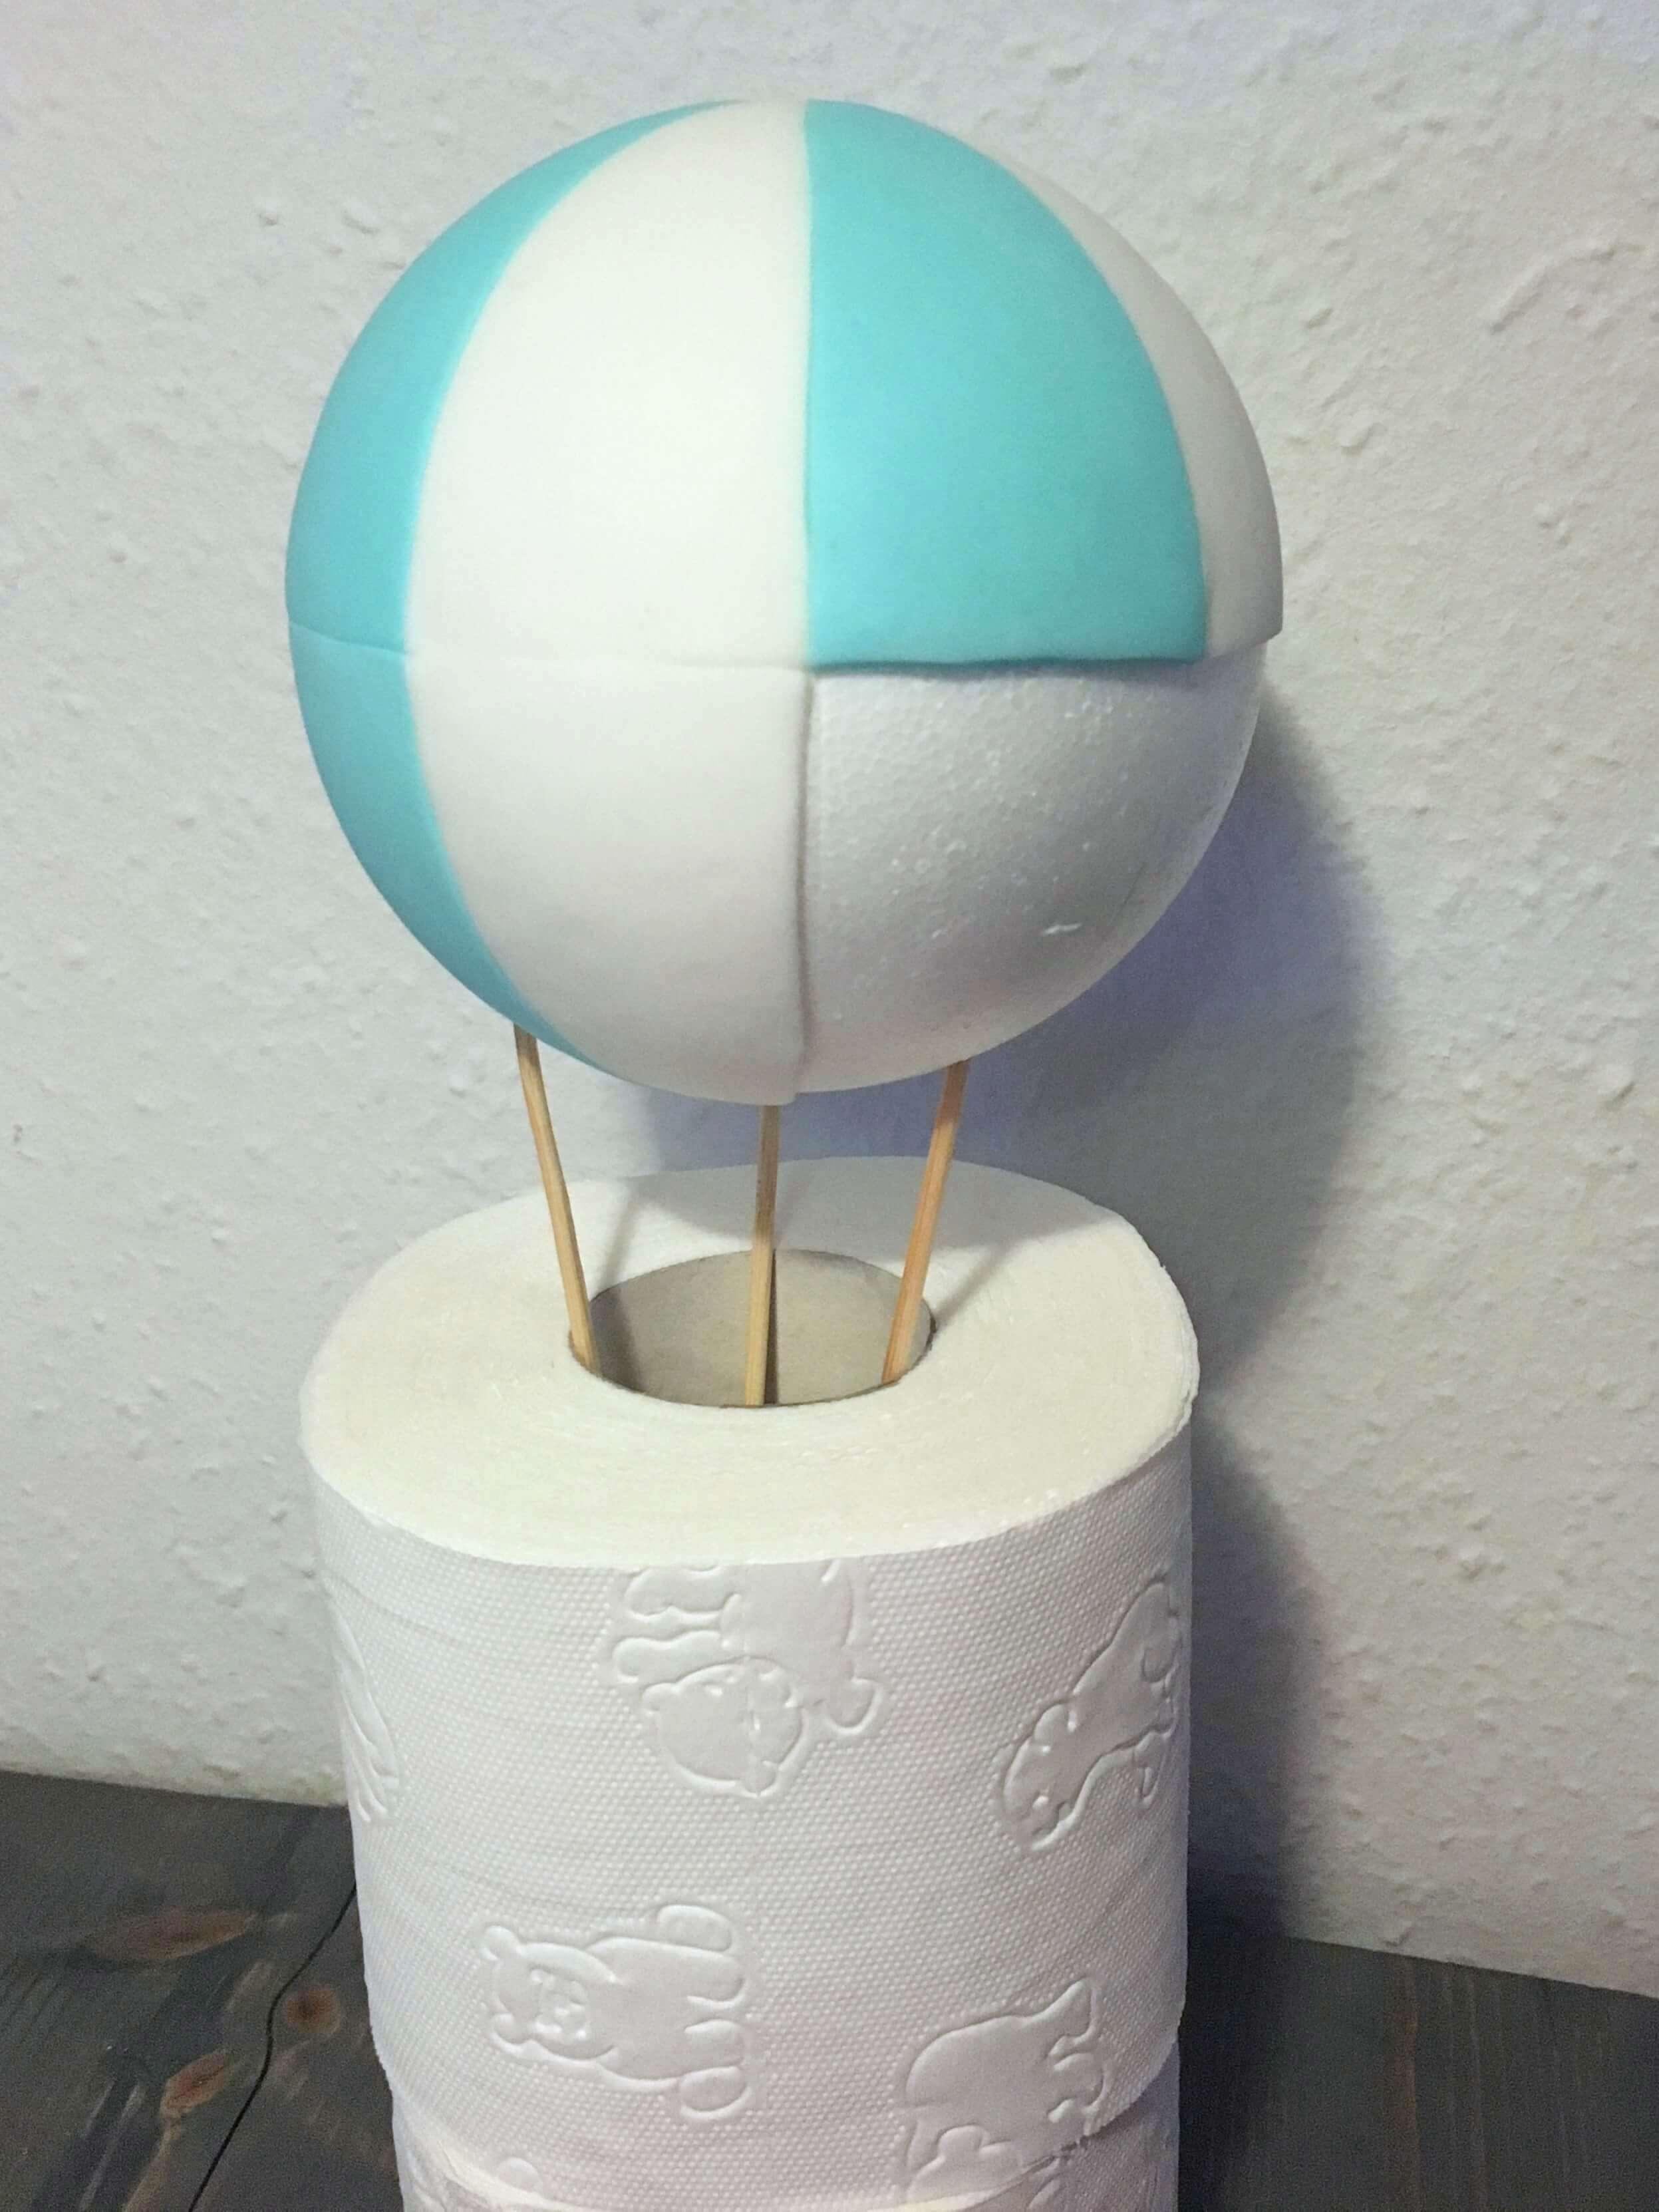 Luftballon step 4